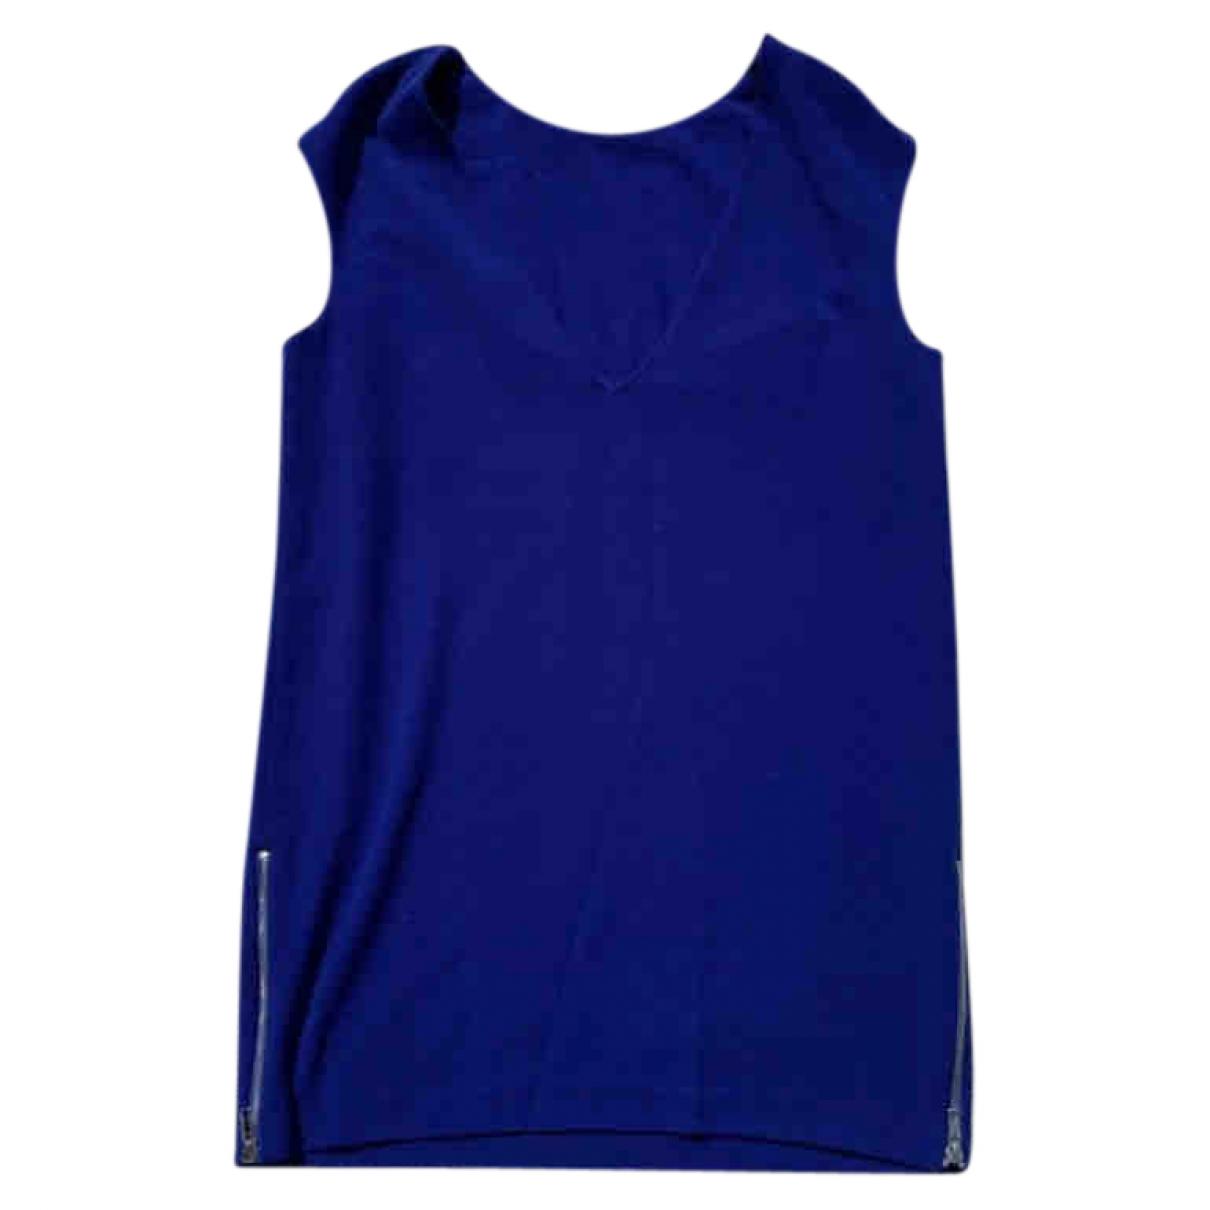 Bel Air \N Blue dress for Women 3 0-5